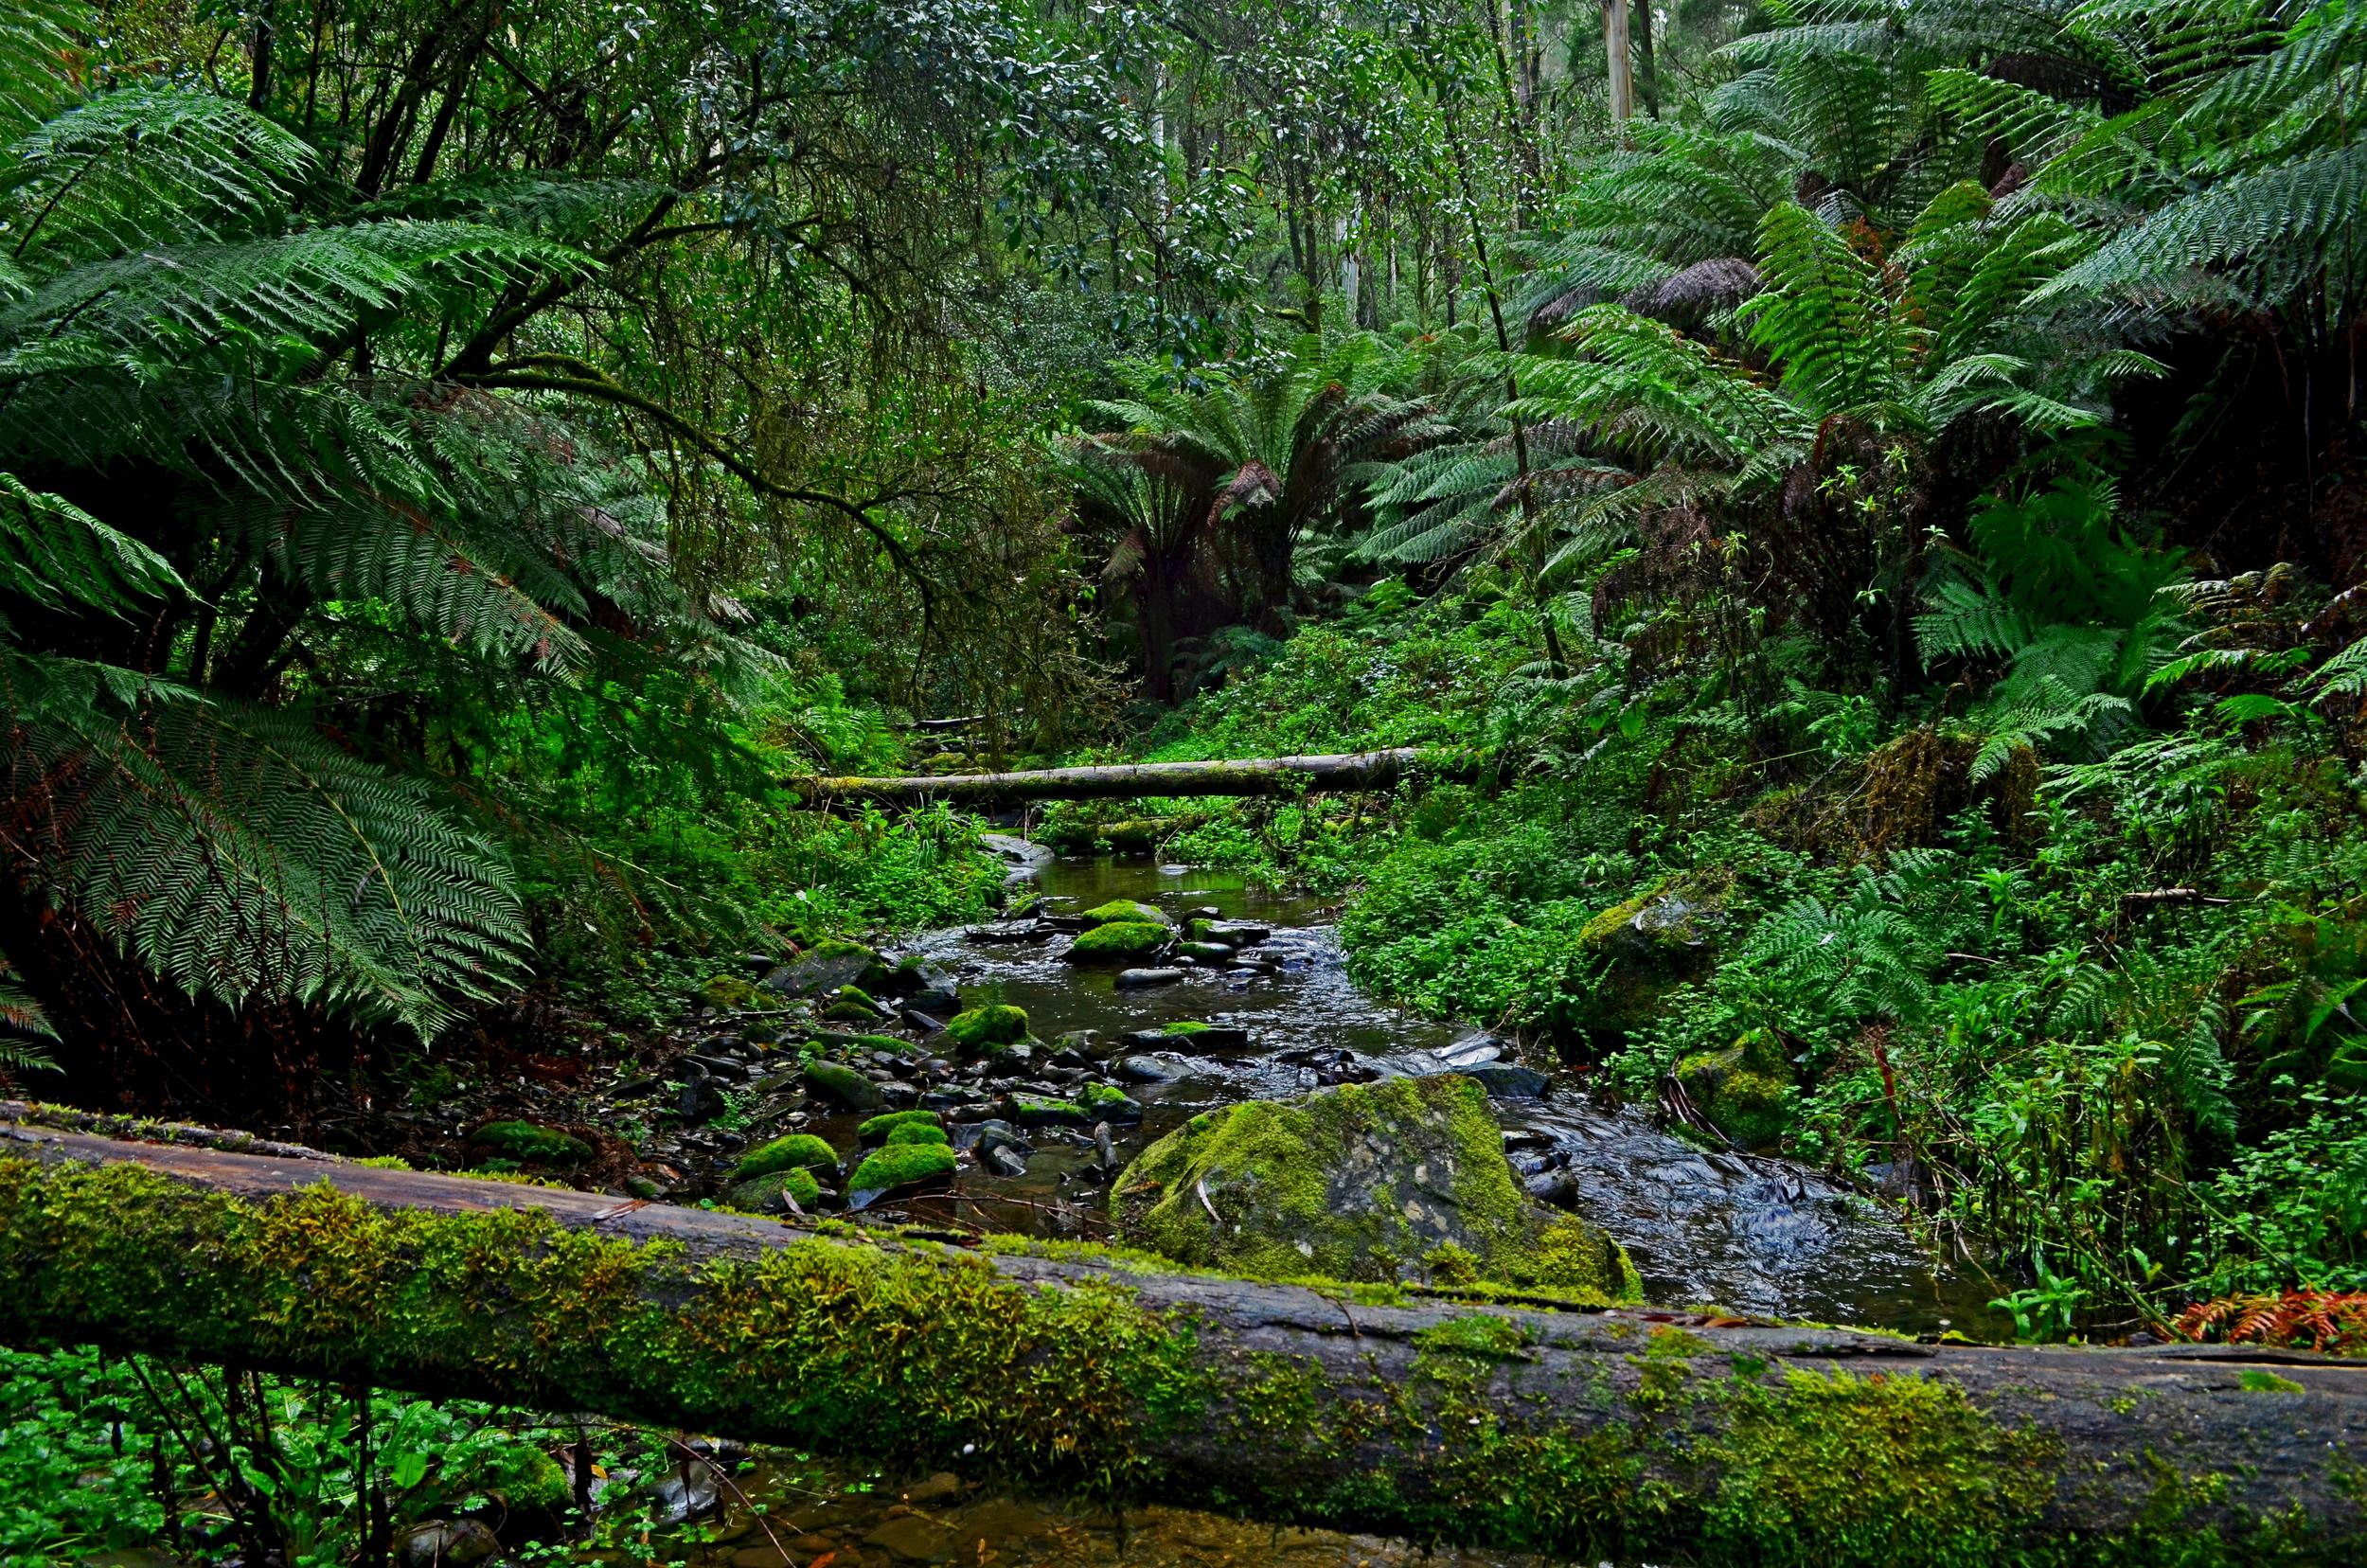 [3] Cape Otway Rainforest, Victoria.